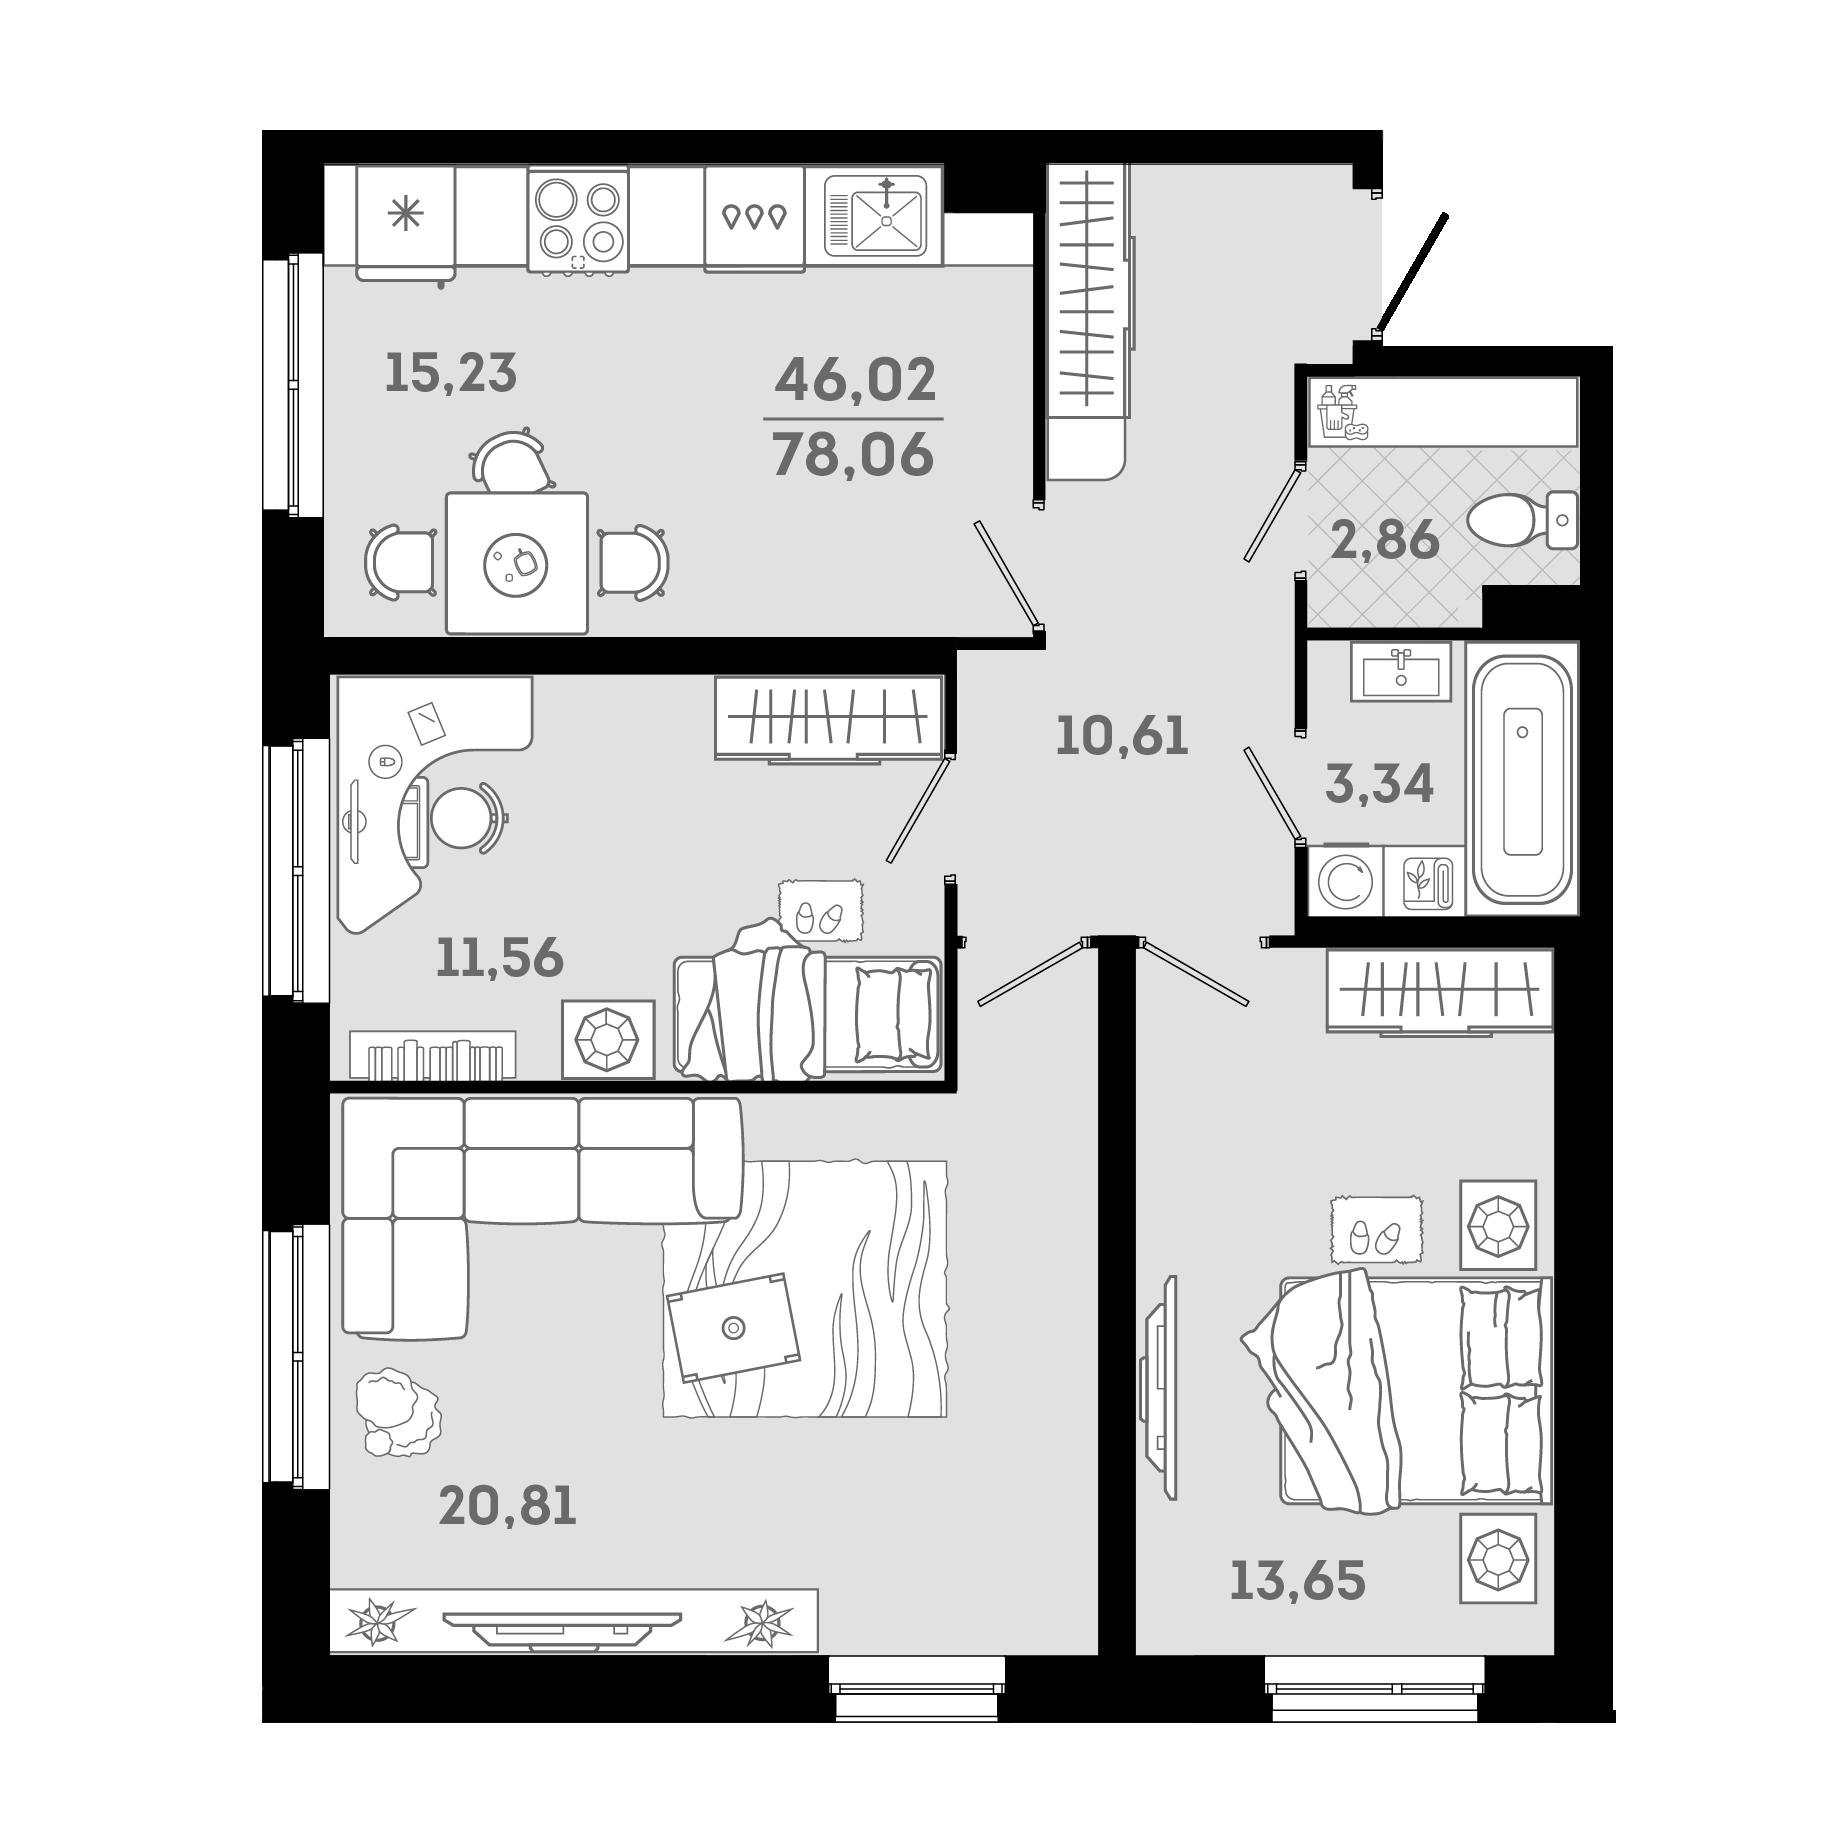 4Е-к.кв, 78.06 м²